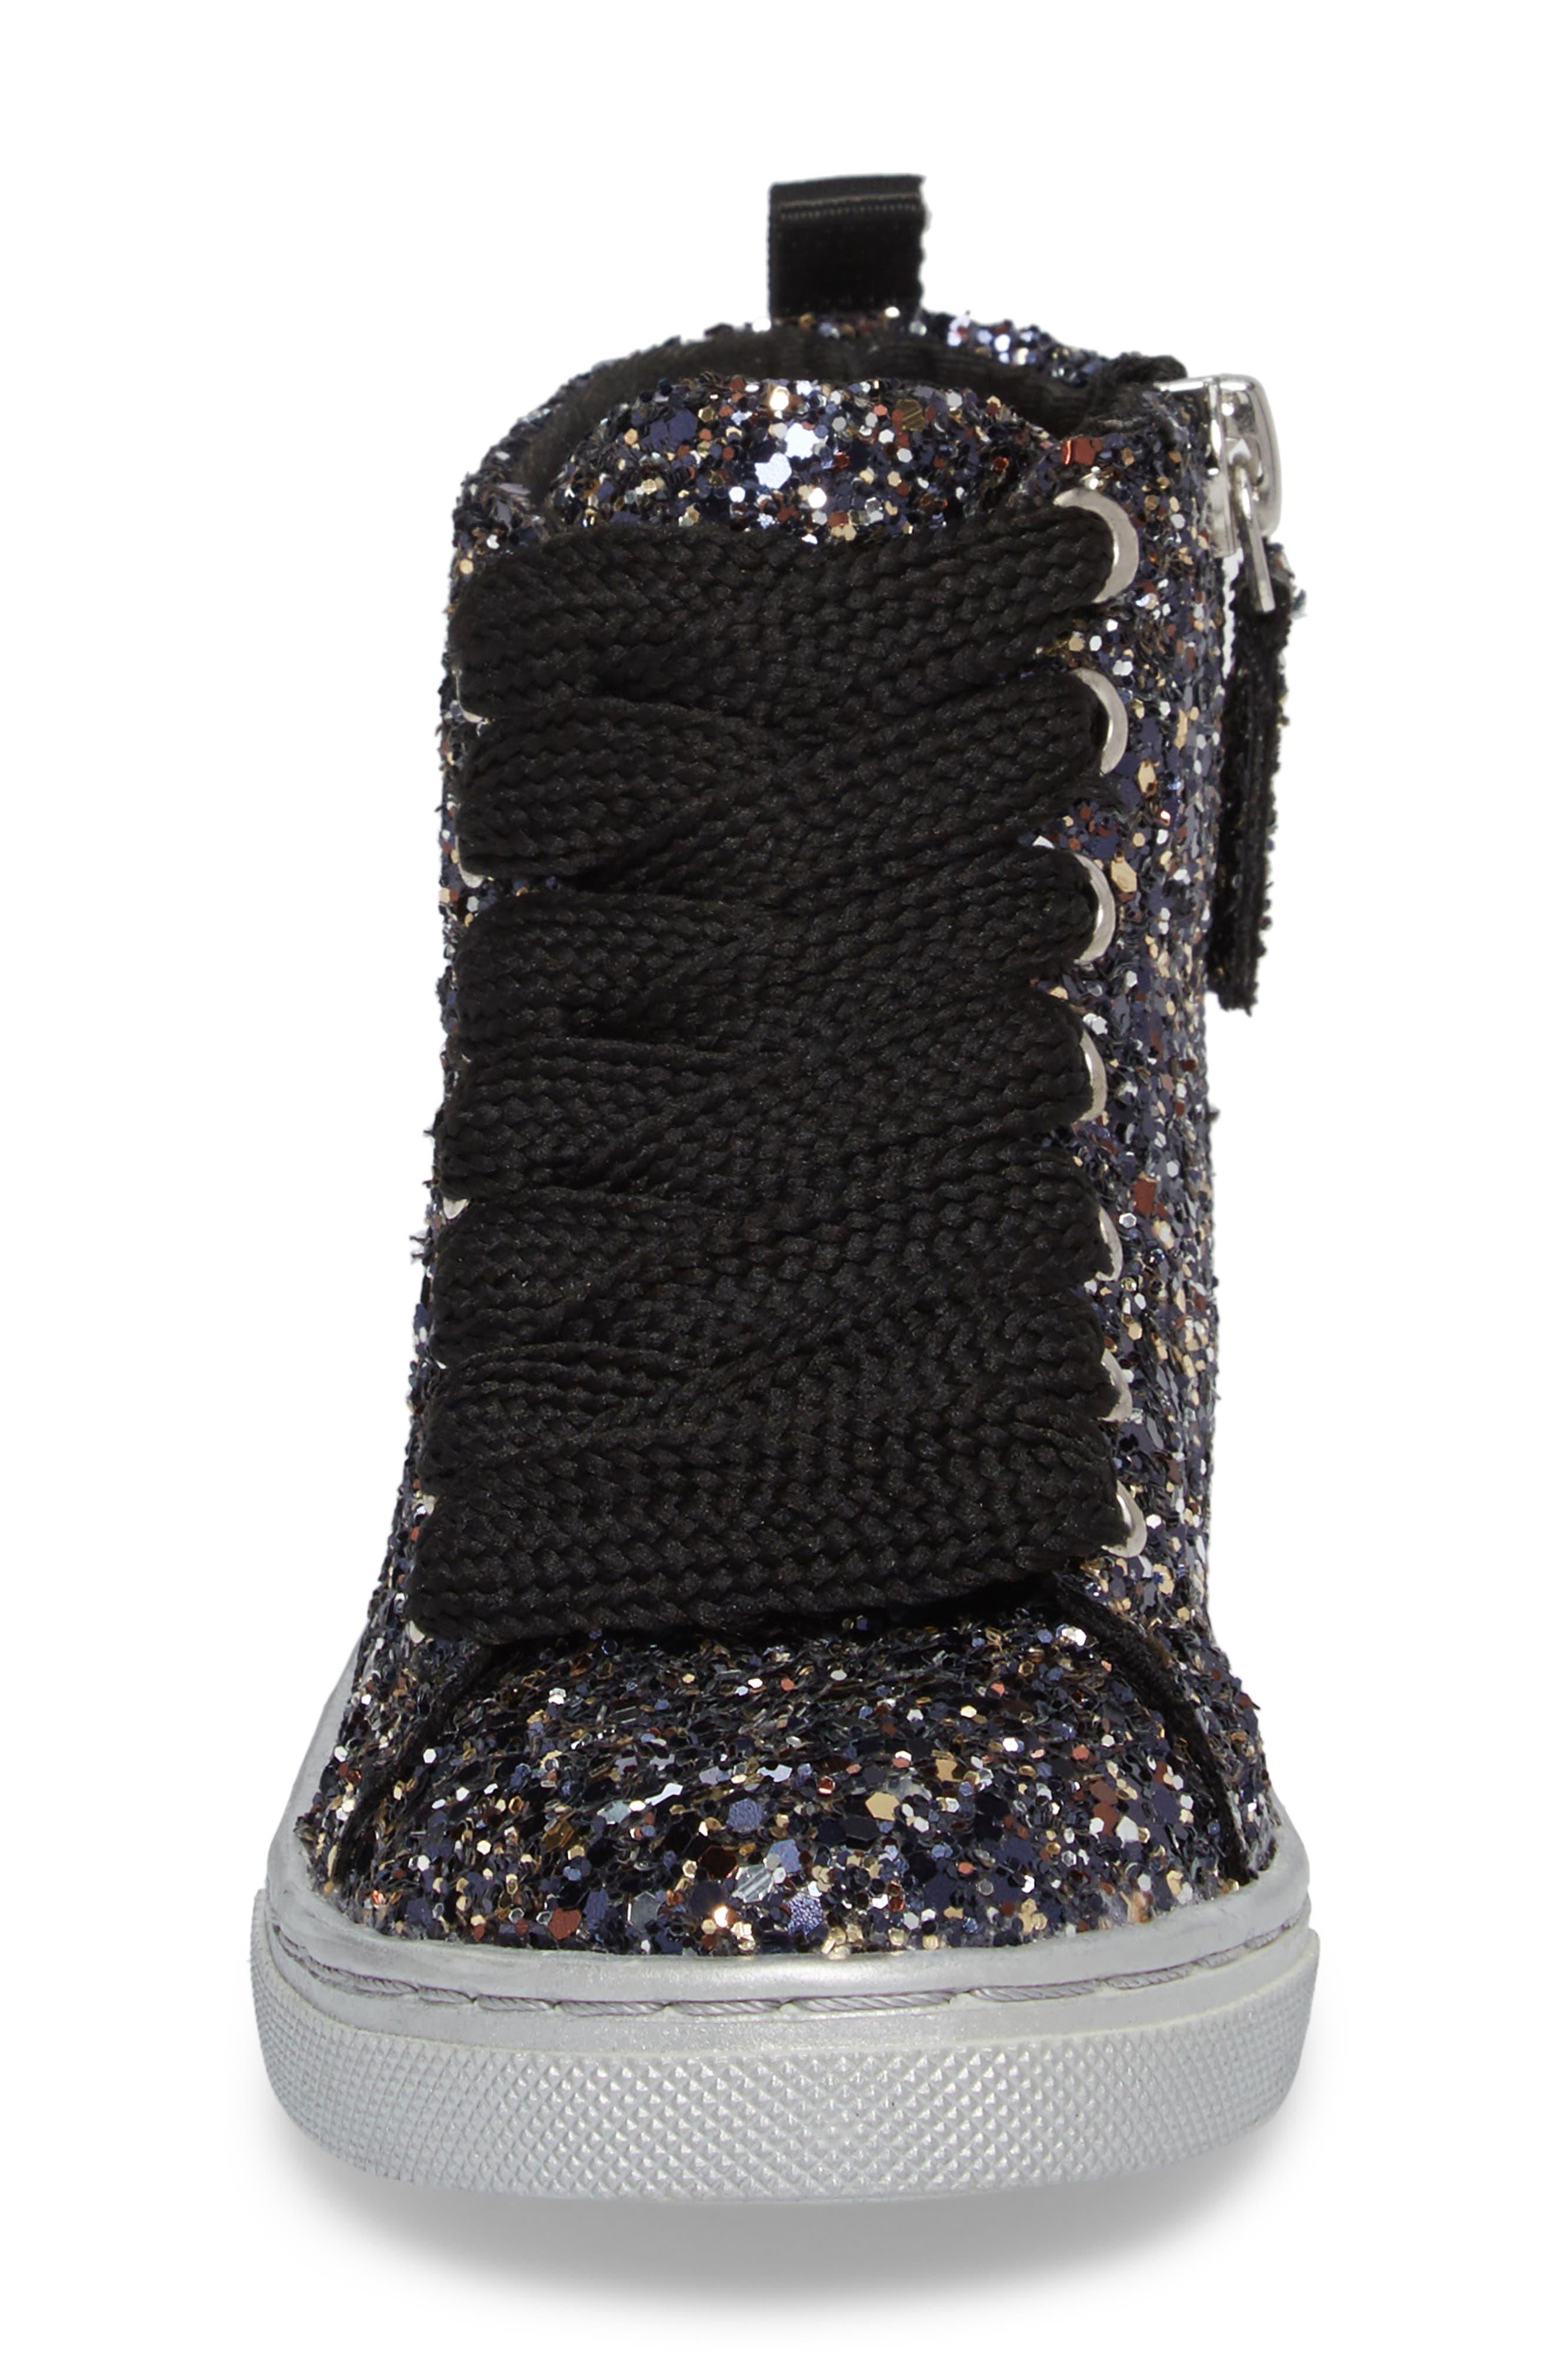 Zaine Glittery High Top Sneaker,                             Alternate thumbnail 4, color,                             Black Multi Glitter